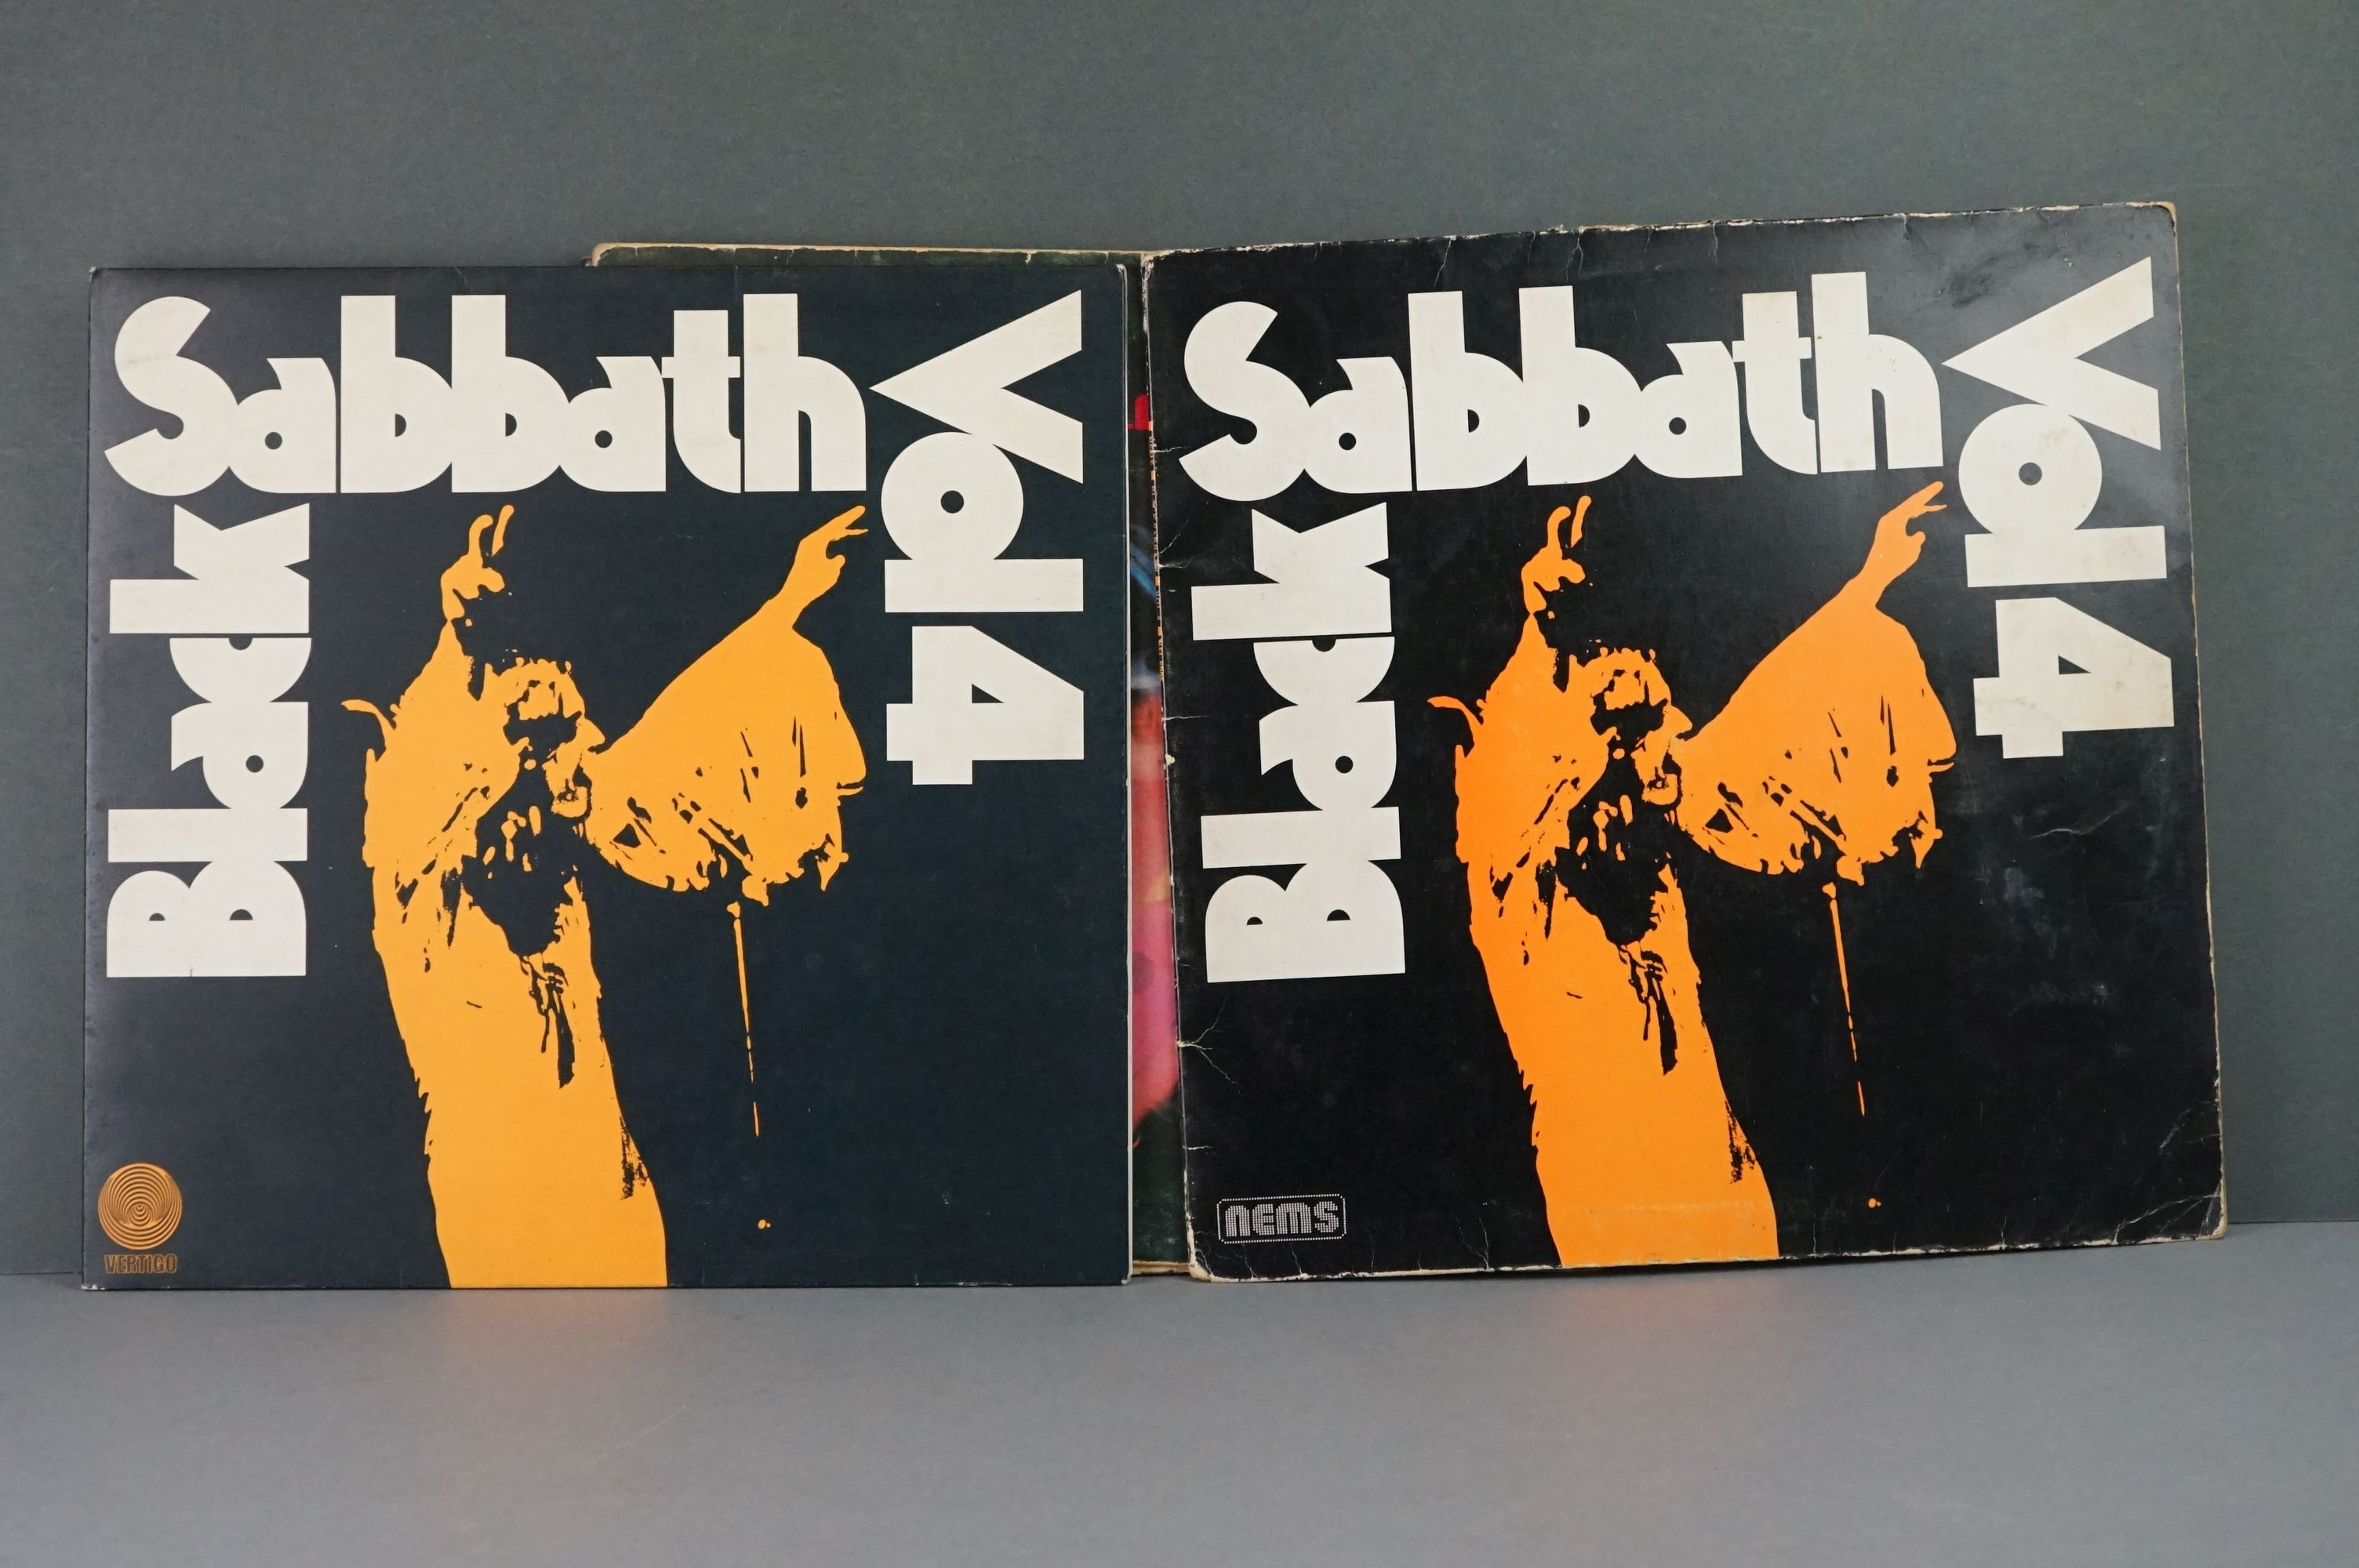 Vinyl - Twelve Black Sabbath vinyl LP's to include Technical Ecstasy (Vertigo Records PRICE 40), - Image 12 of 17